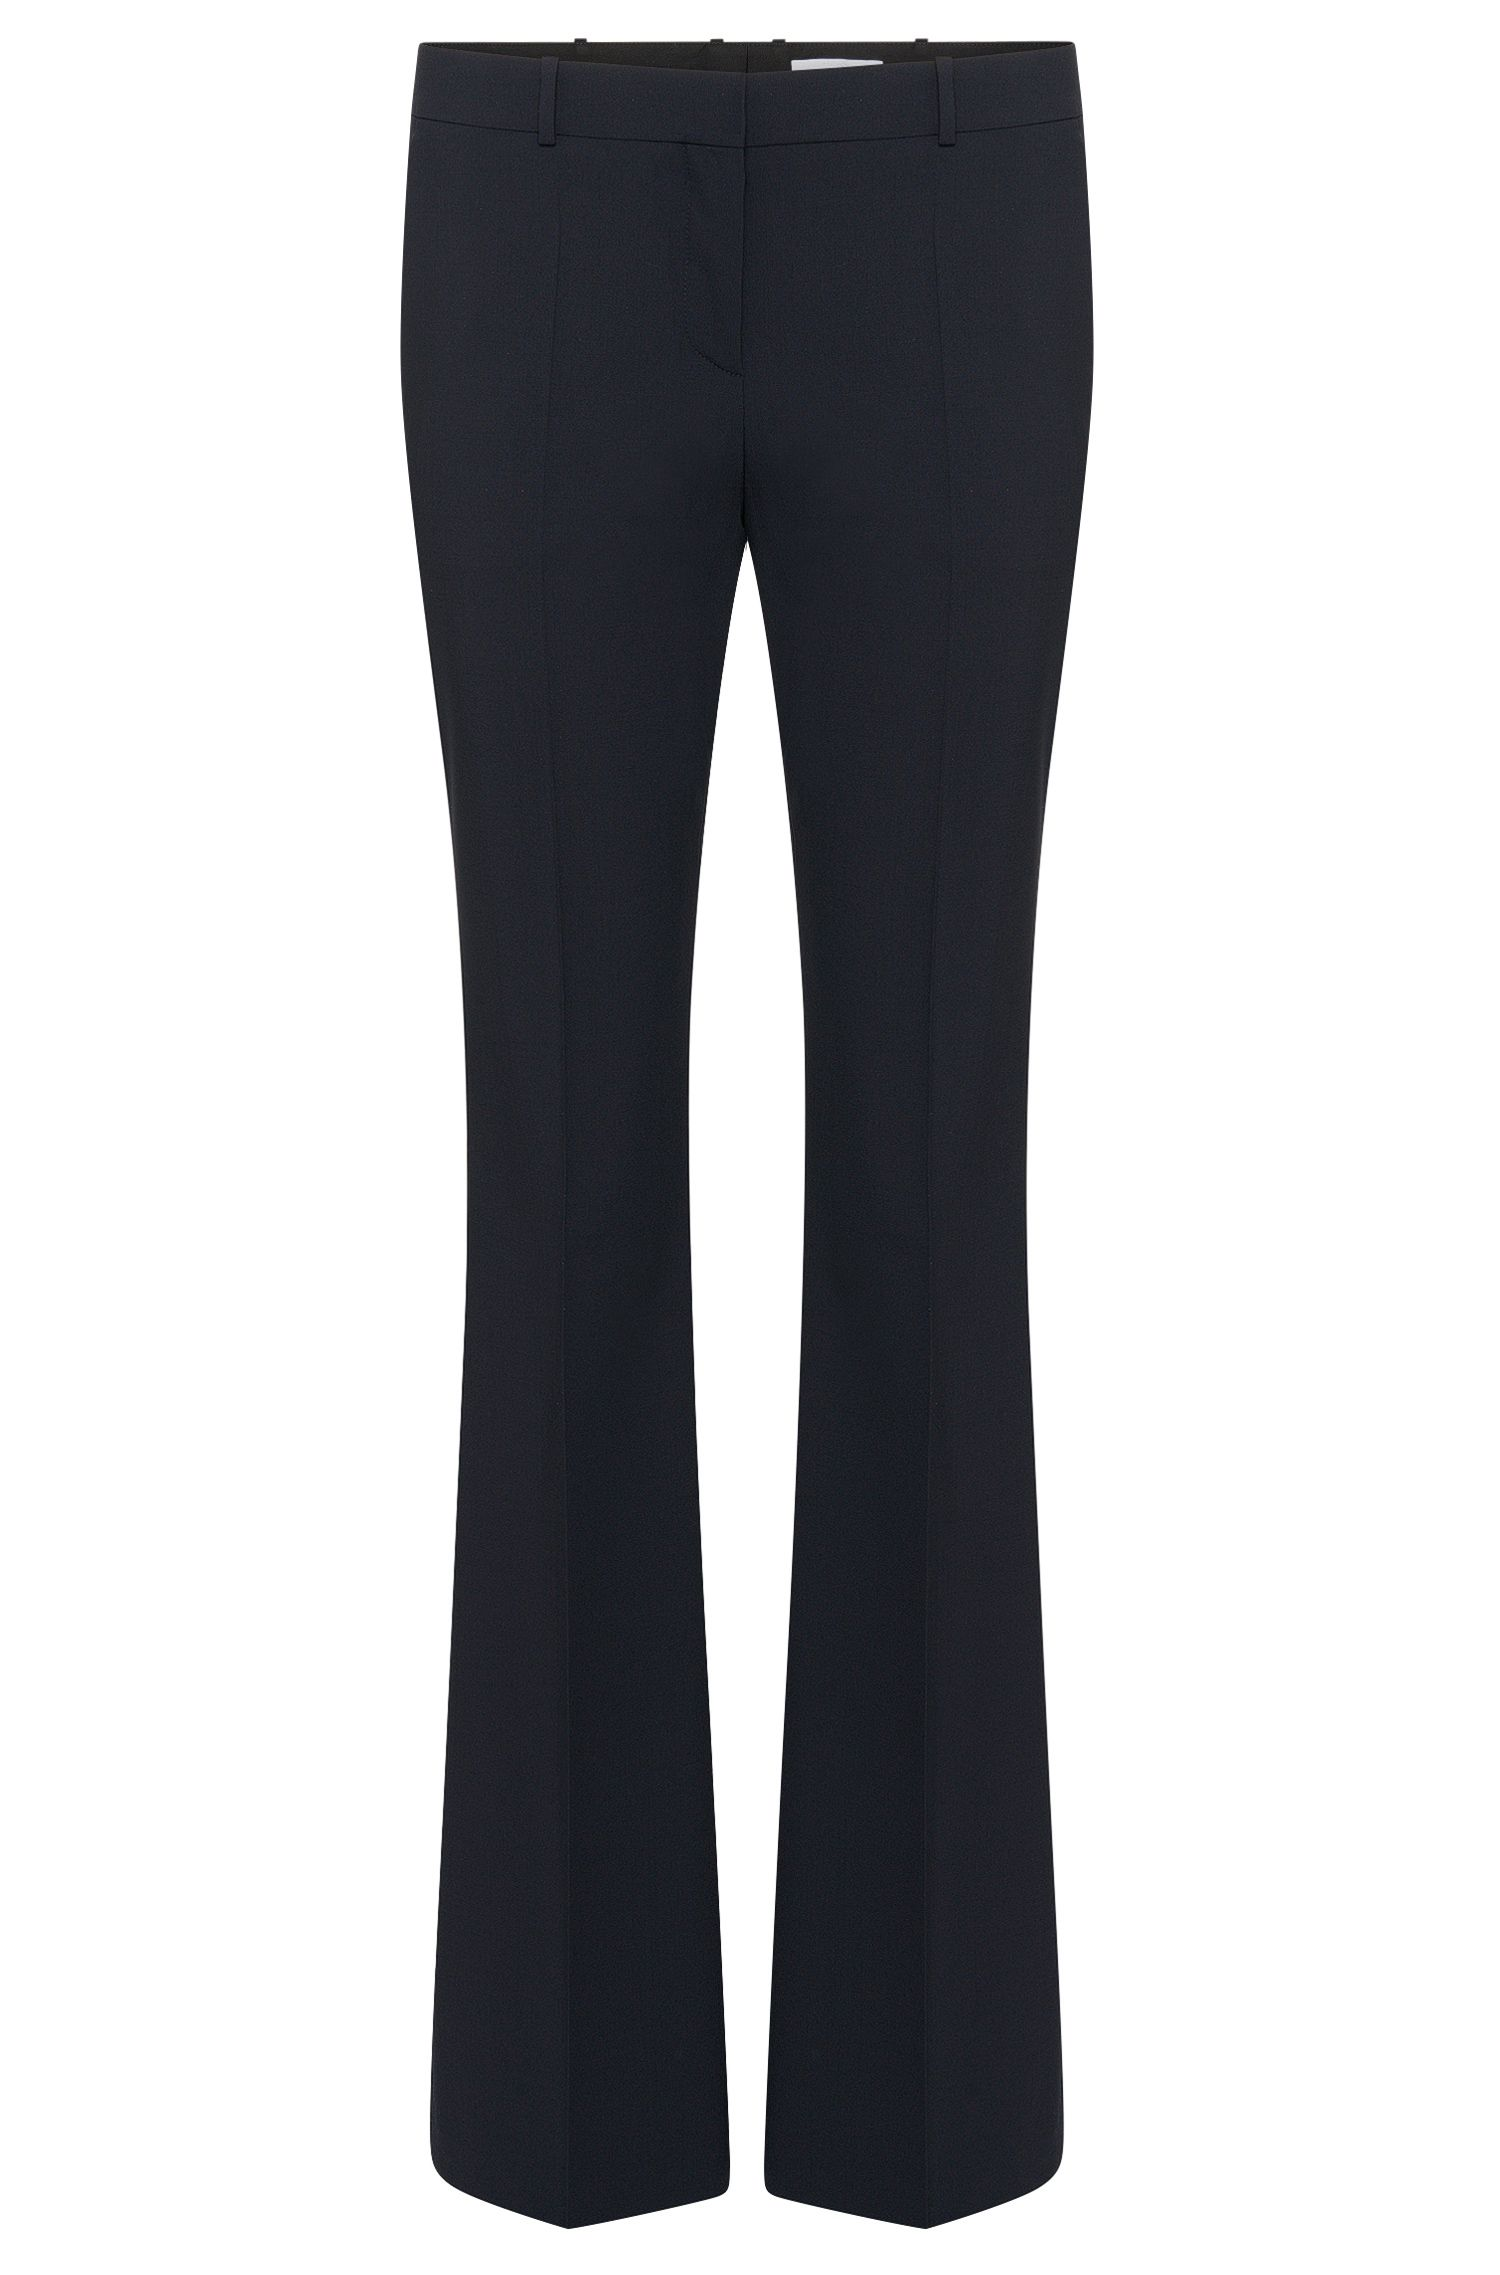 'Tulea Front Zip'   Stretch Virgin Wool Boot Cut Dress Pants